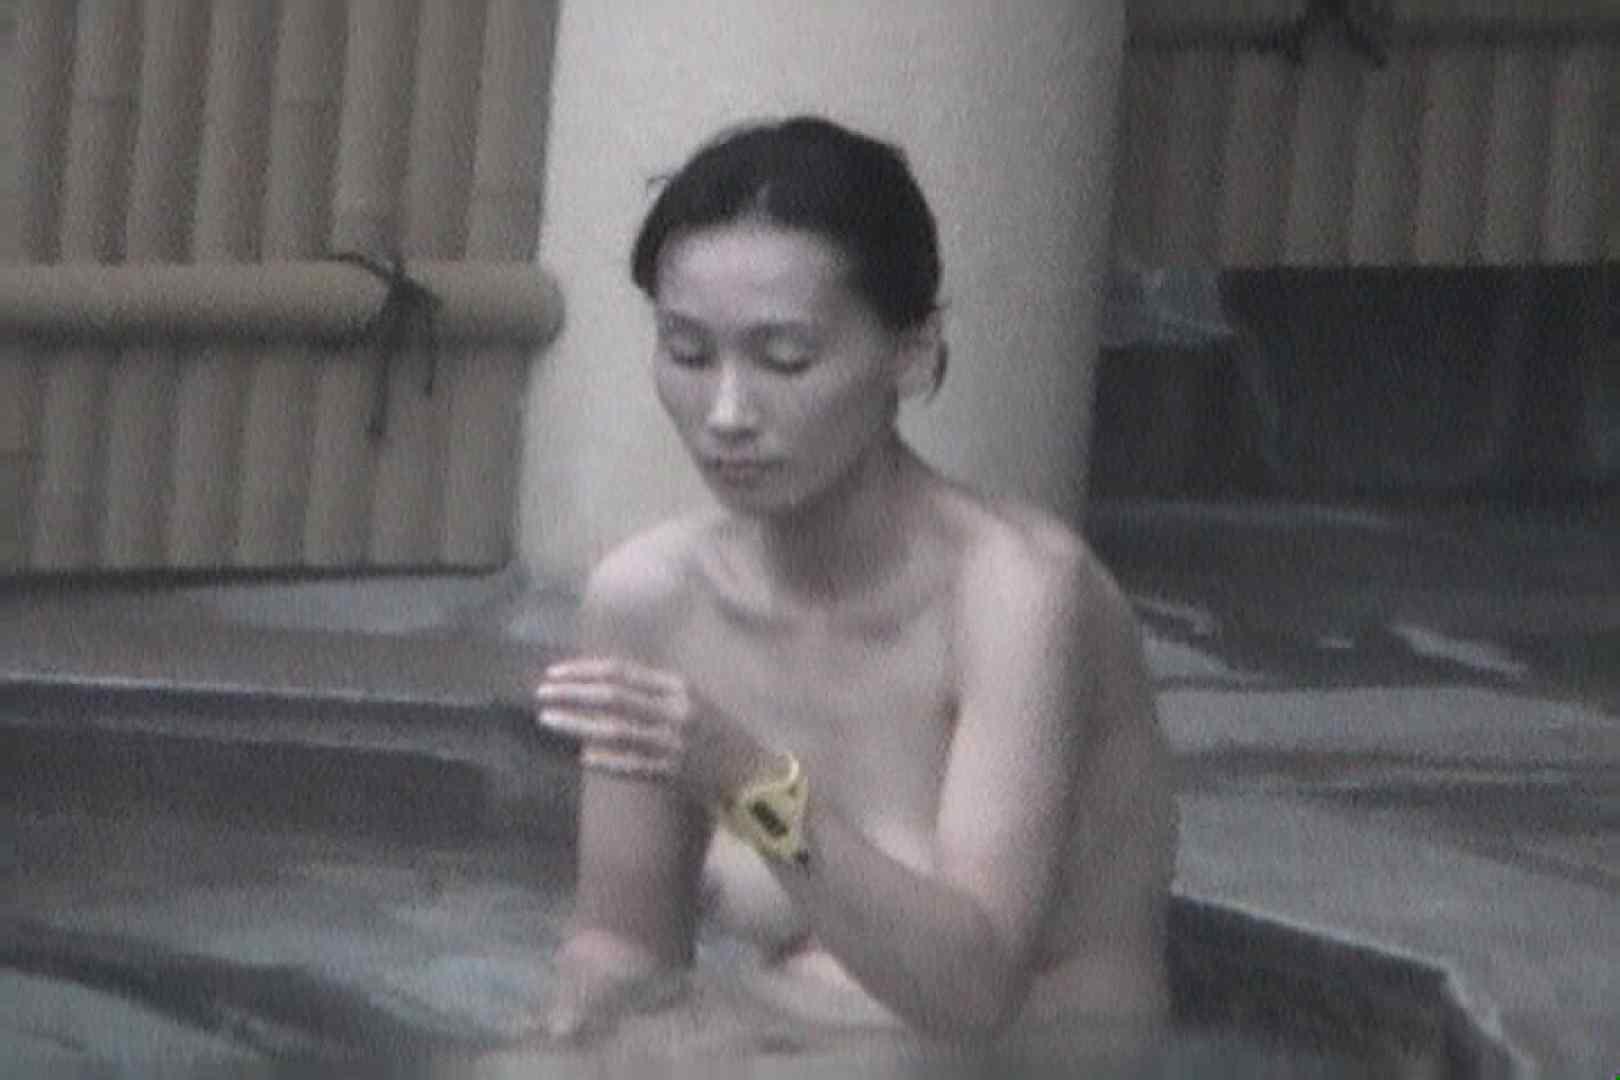 Aquaな露天風呂Vol.557 露天 われめAV動画紹介 78枚 8